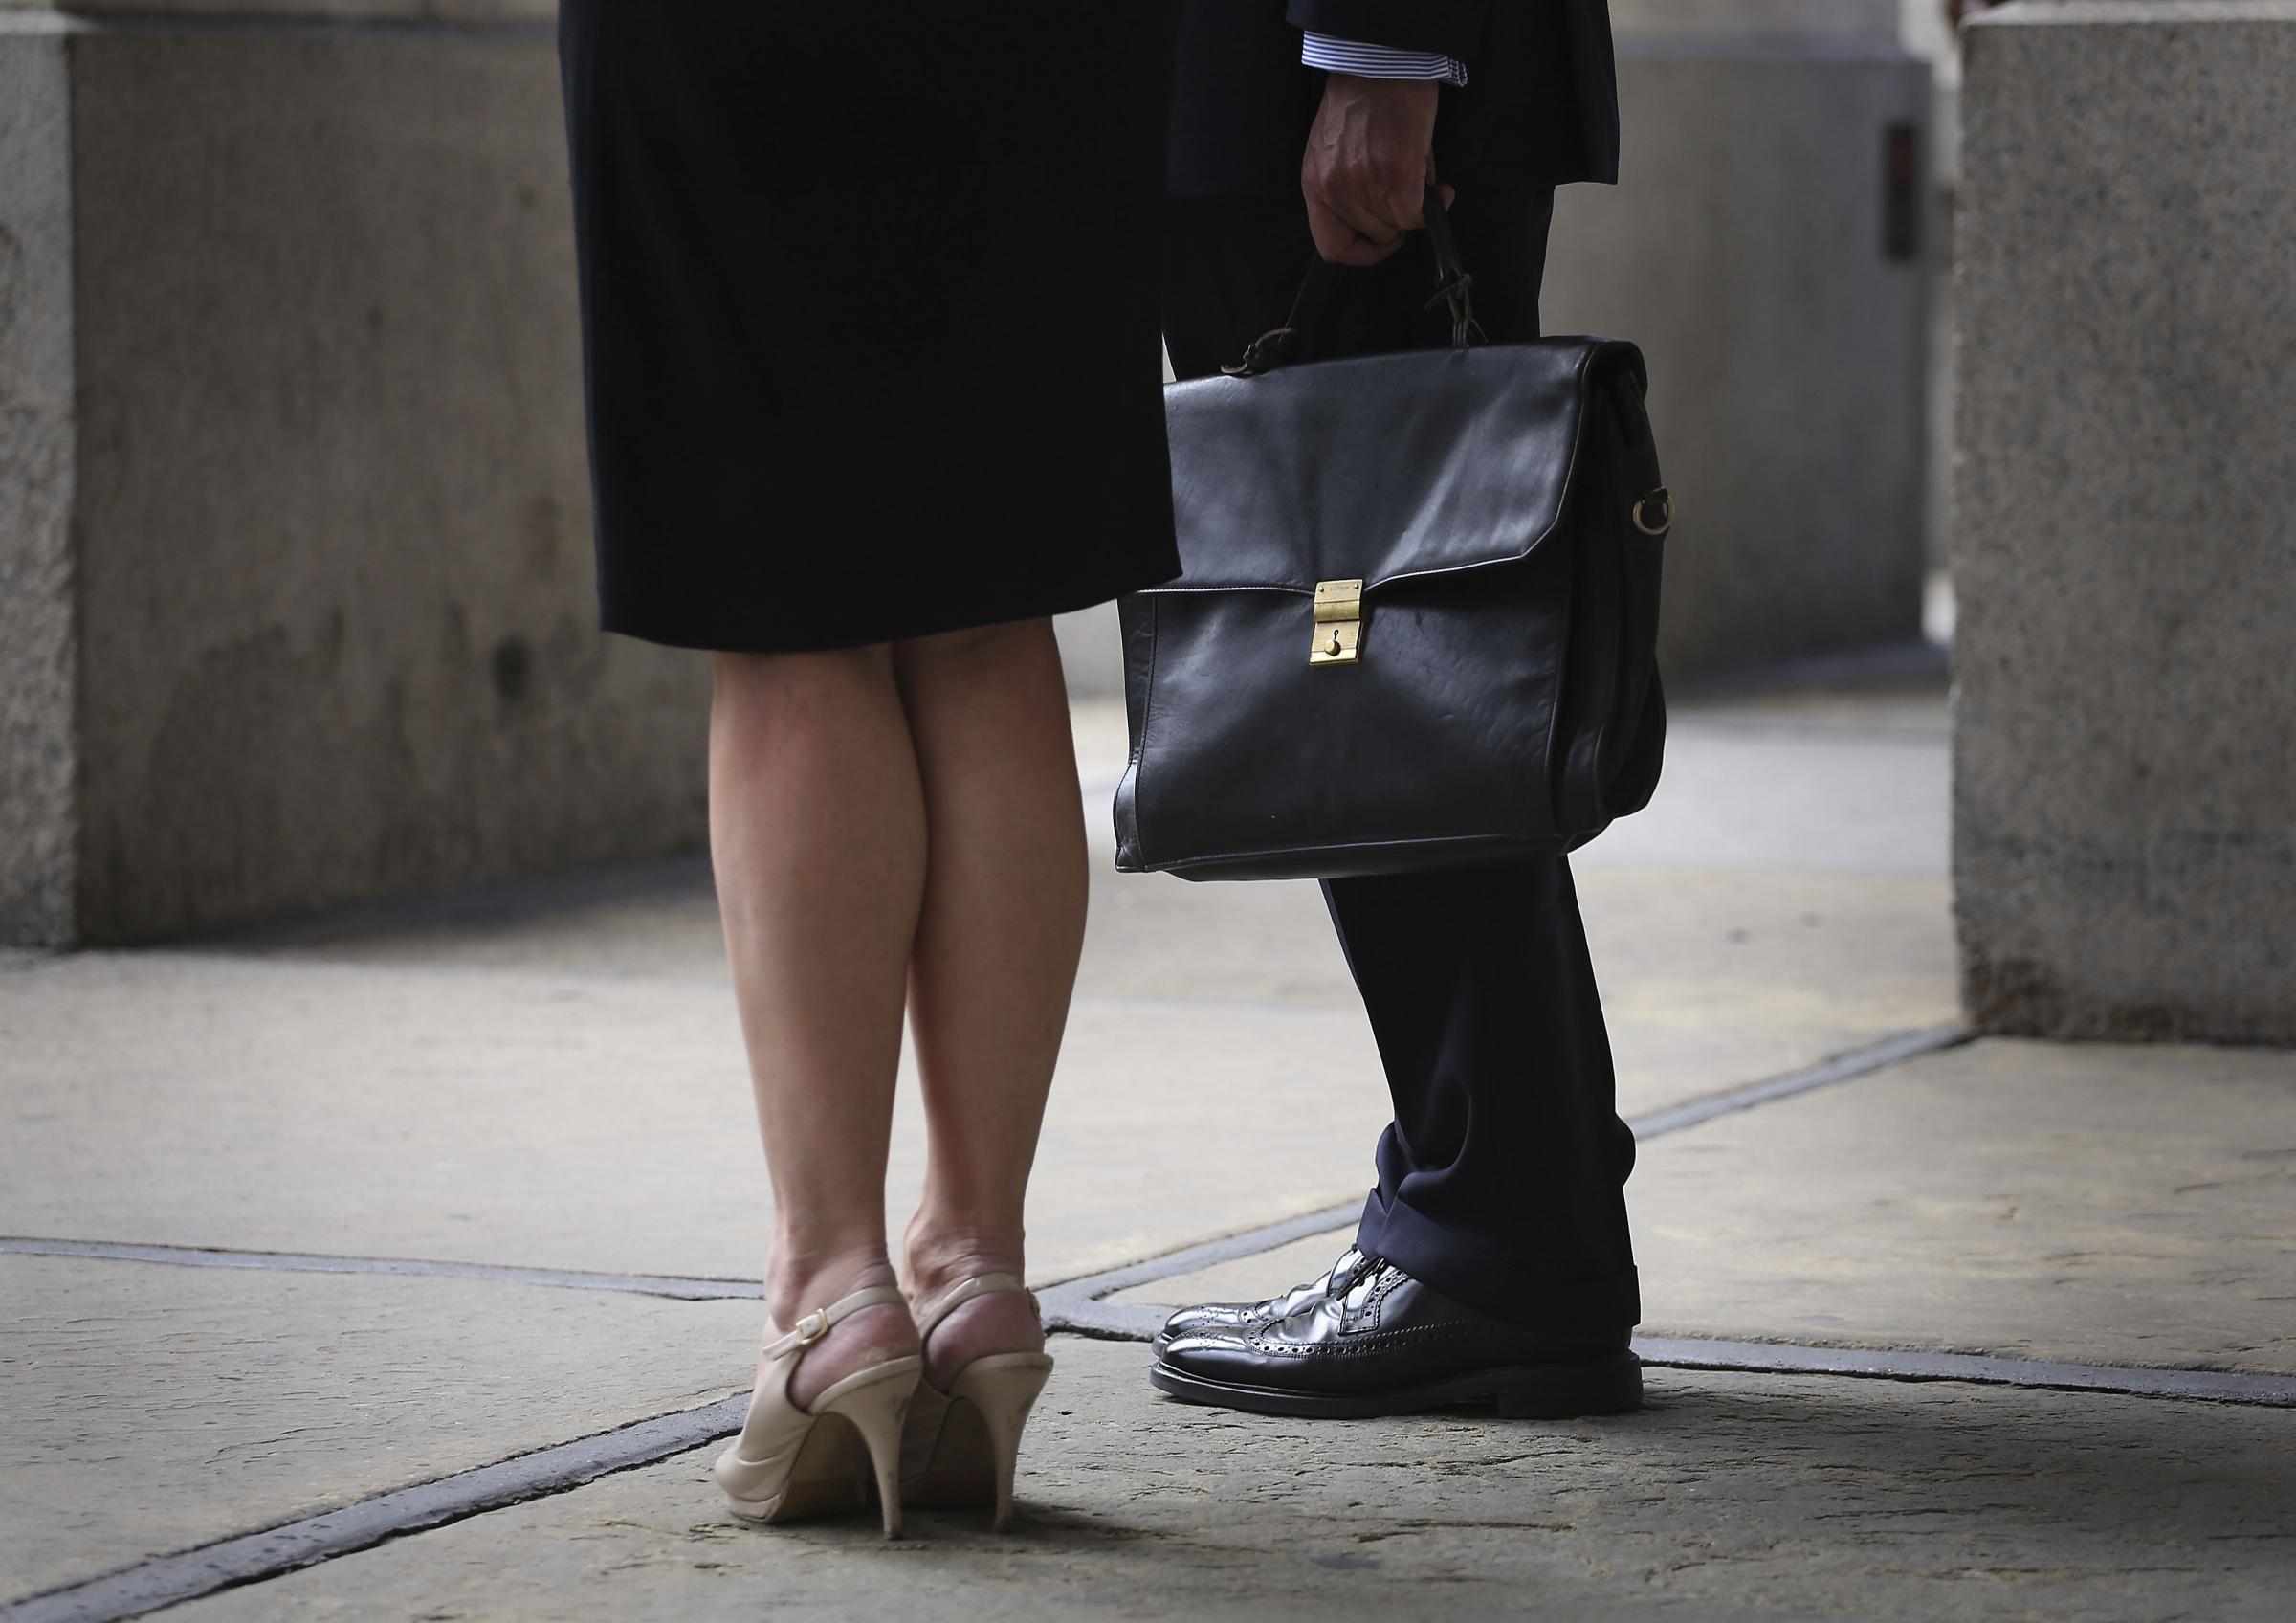 Gender pay gap, alle imprenditrici meno soldi